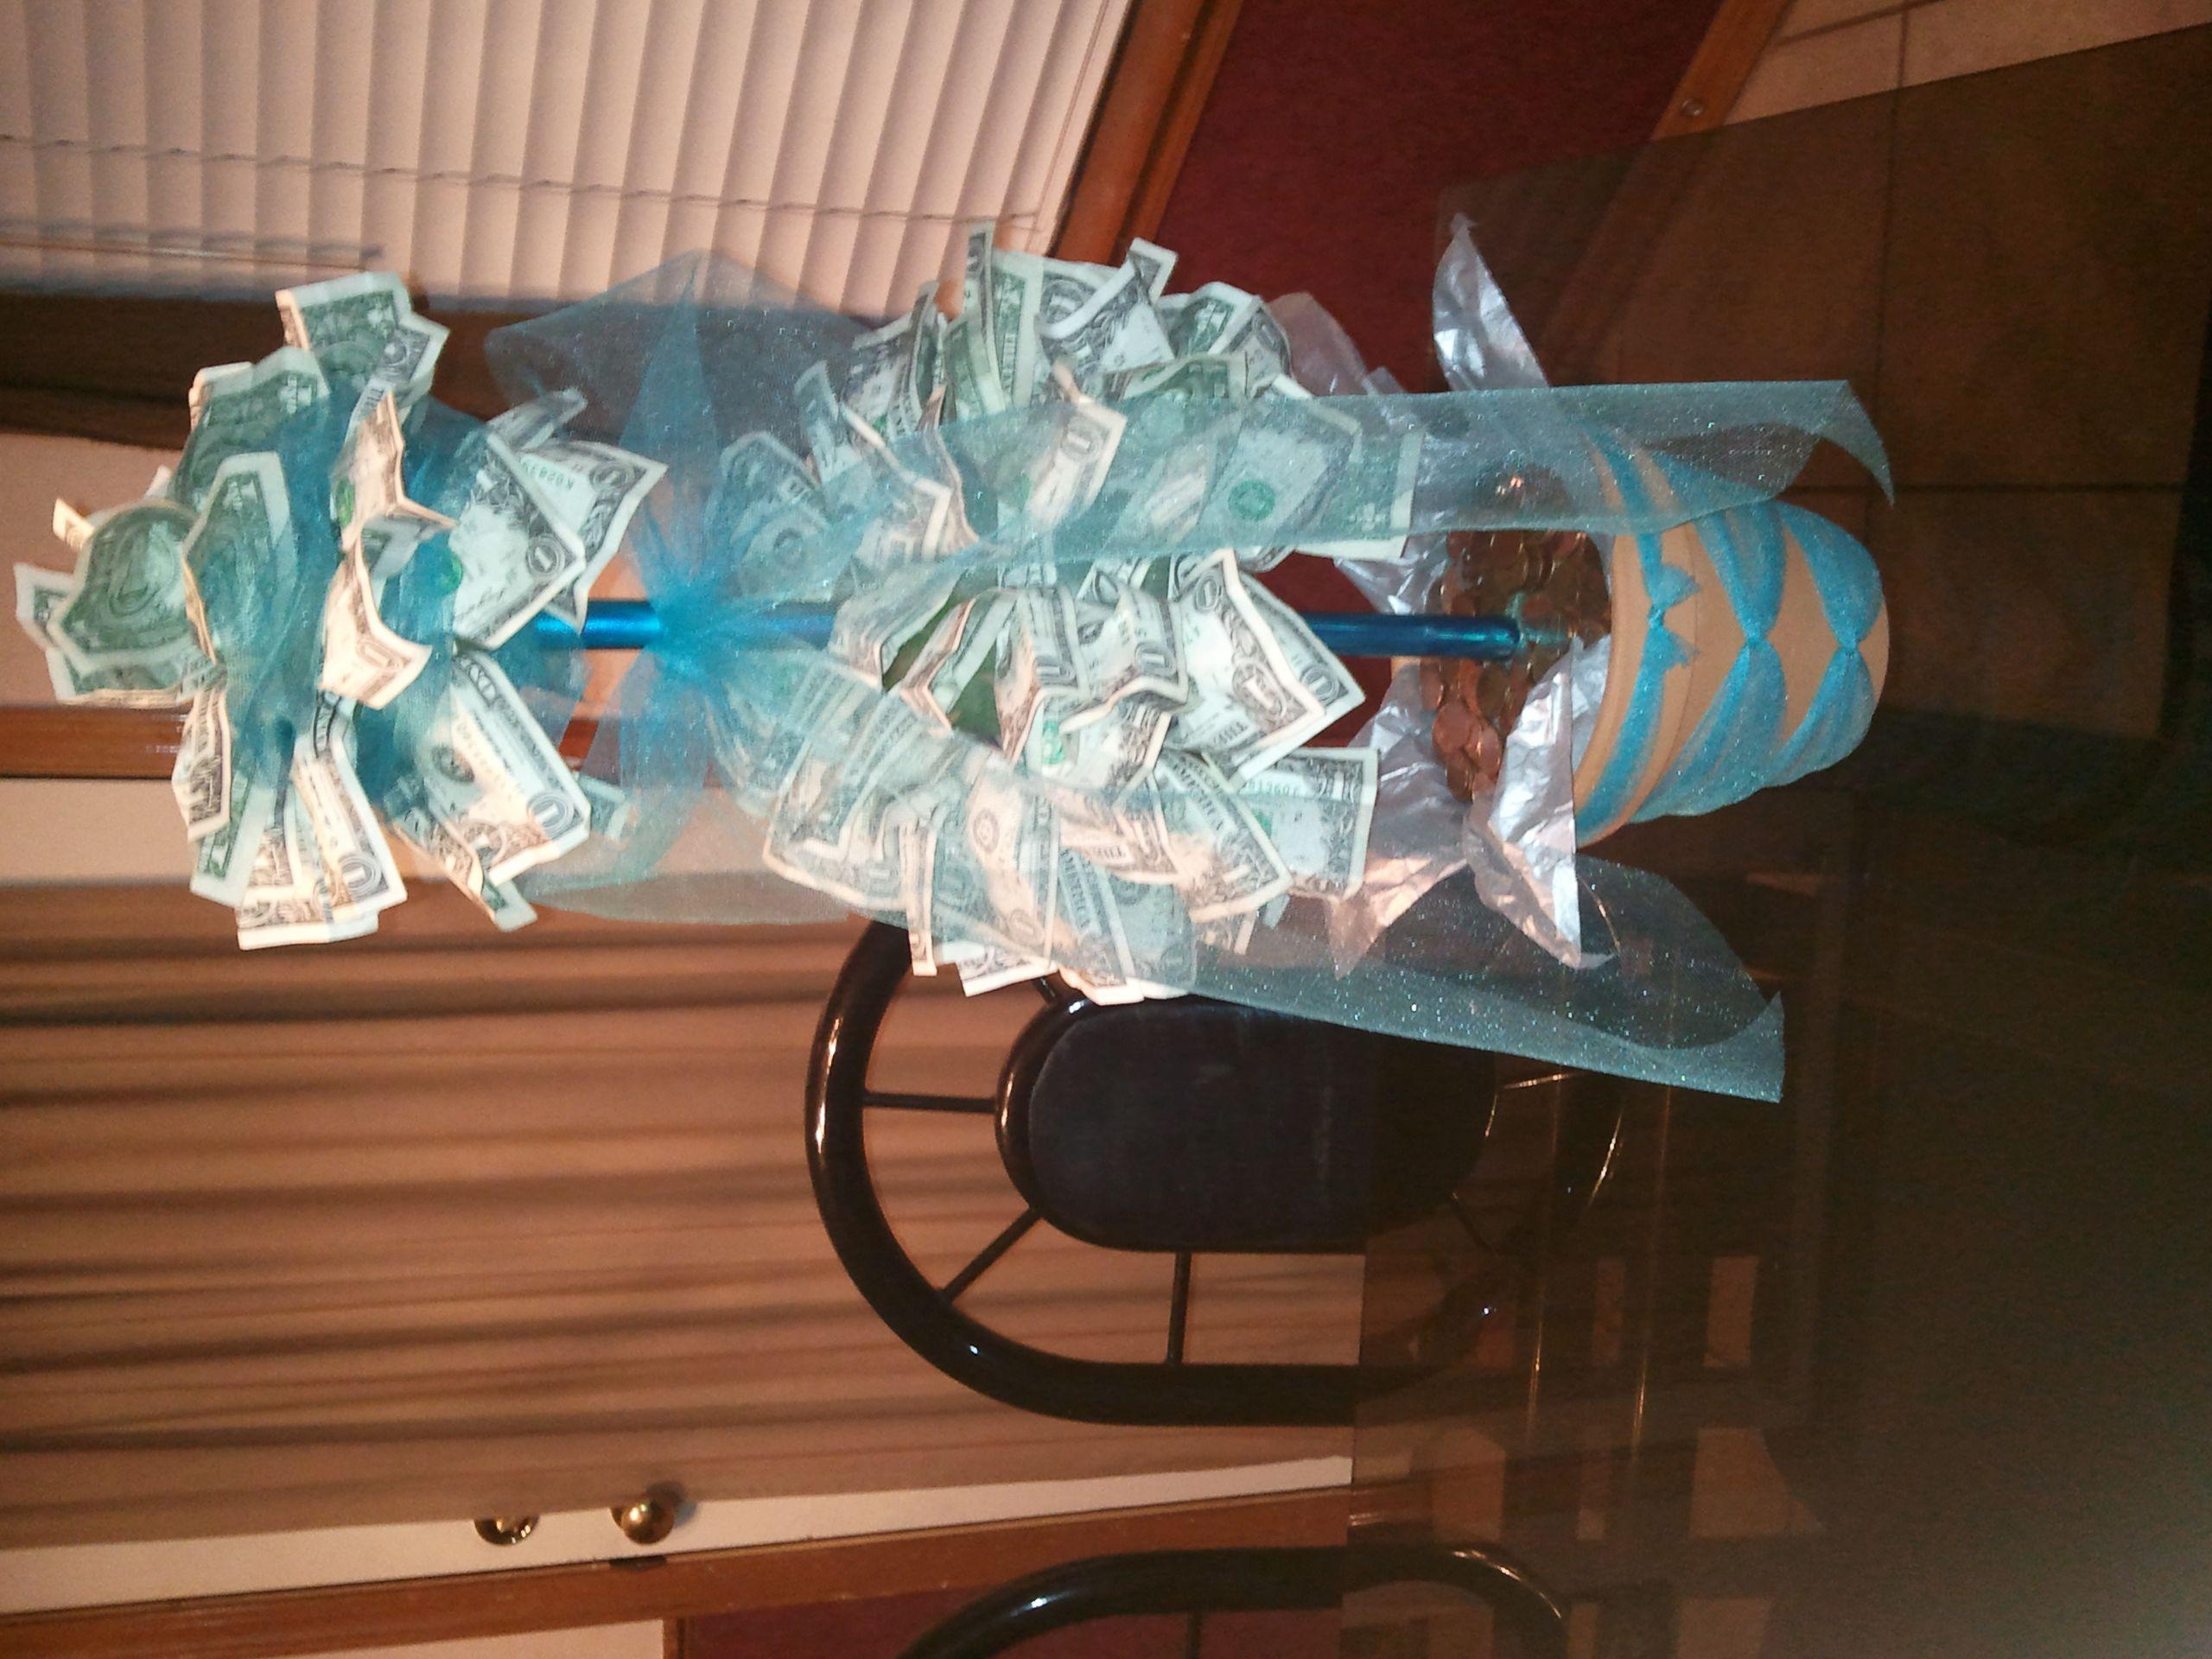 Money Tree - Wedding Gift idea | Money gifts | Pinterest | Money ...